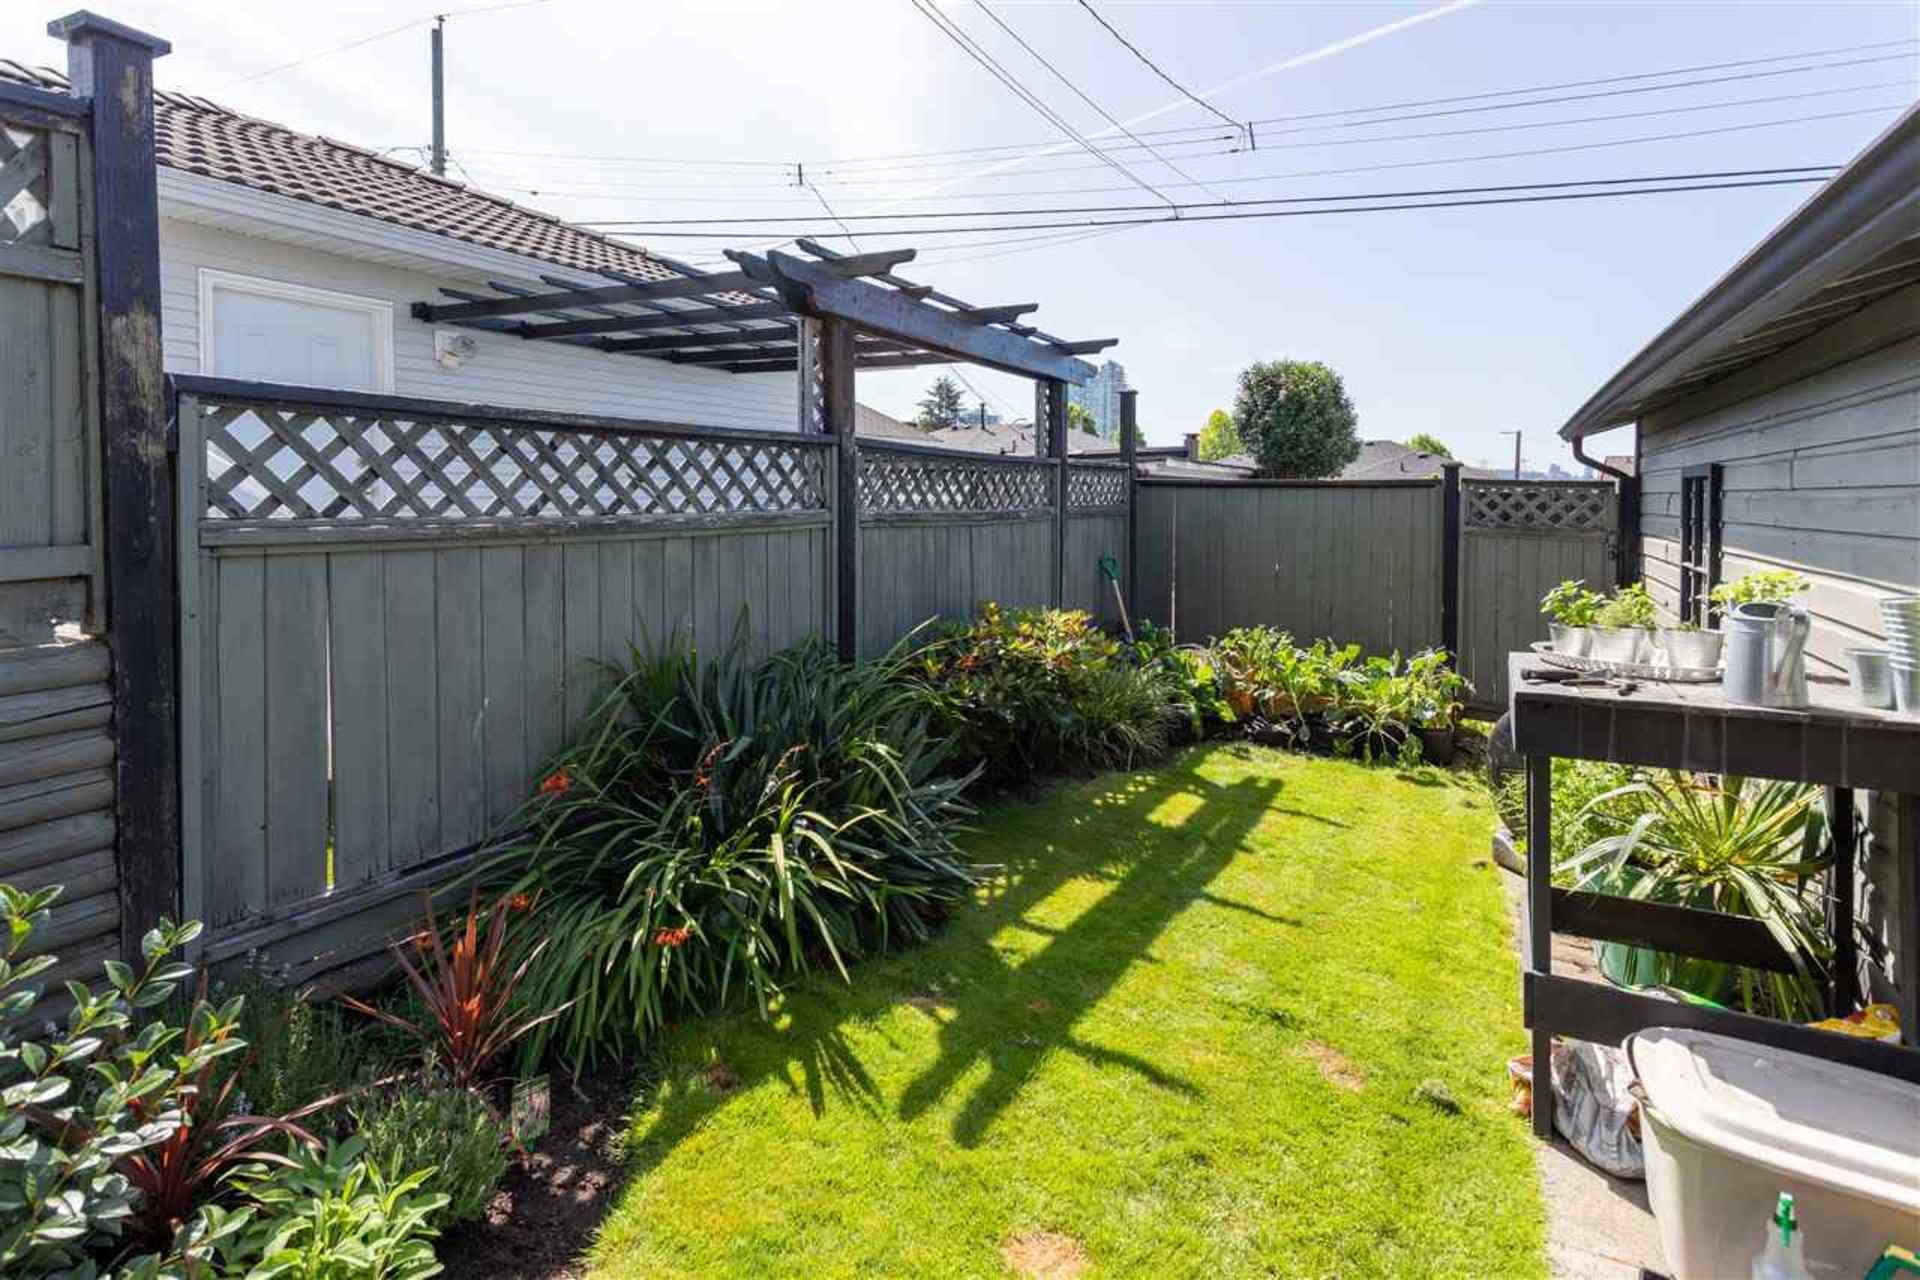 3912-parker-street-willingdon-heights-burnaby-north-32 at 3912 Parker Street, Willingdon Heights, Burnaby North